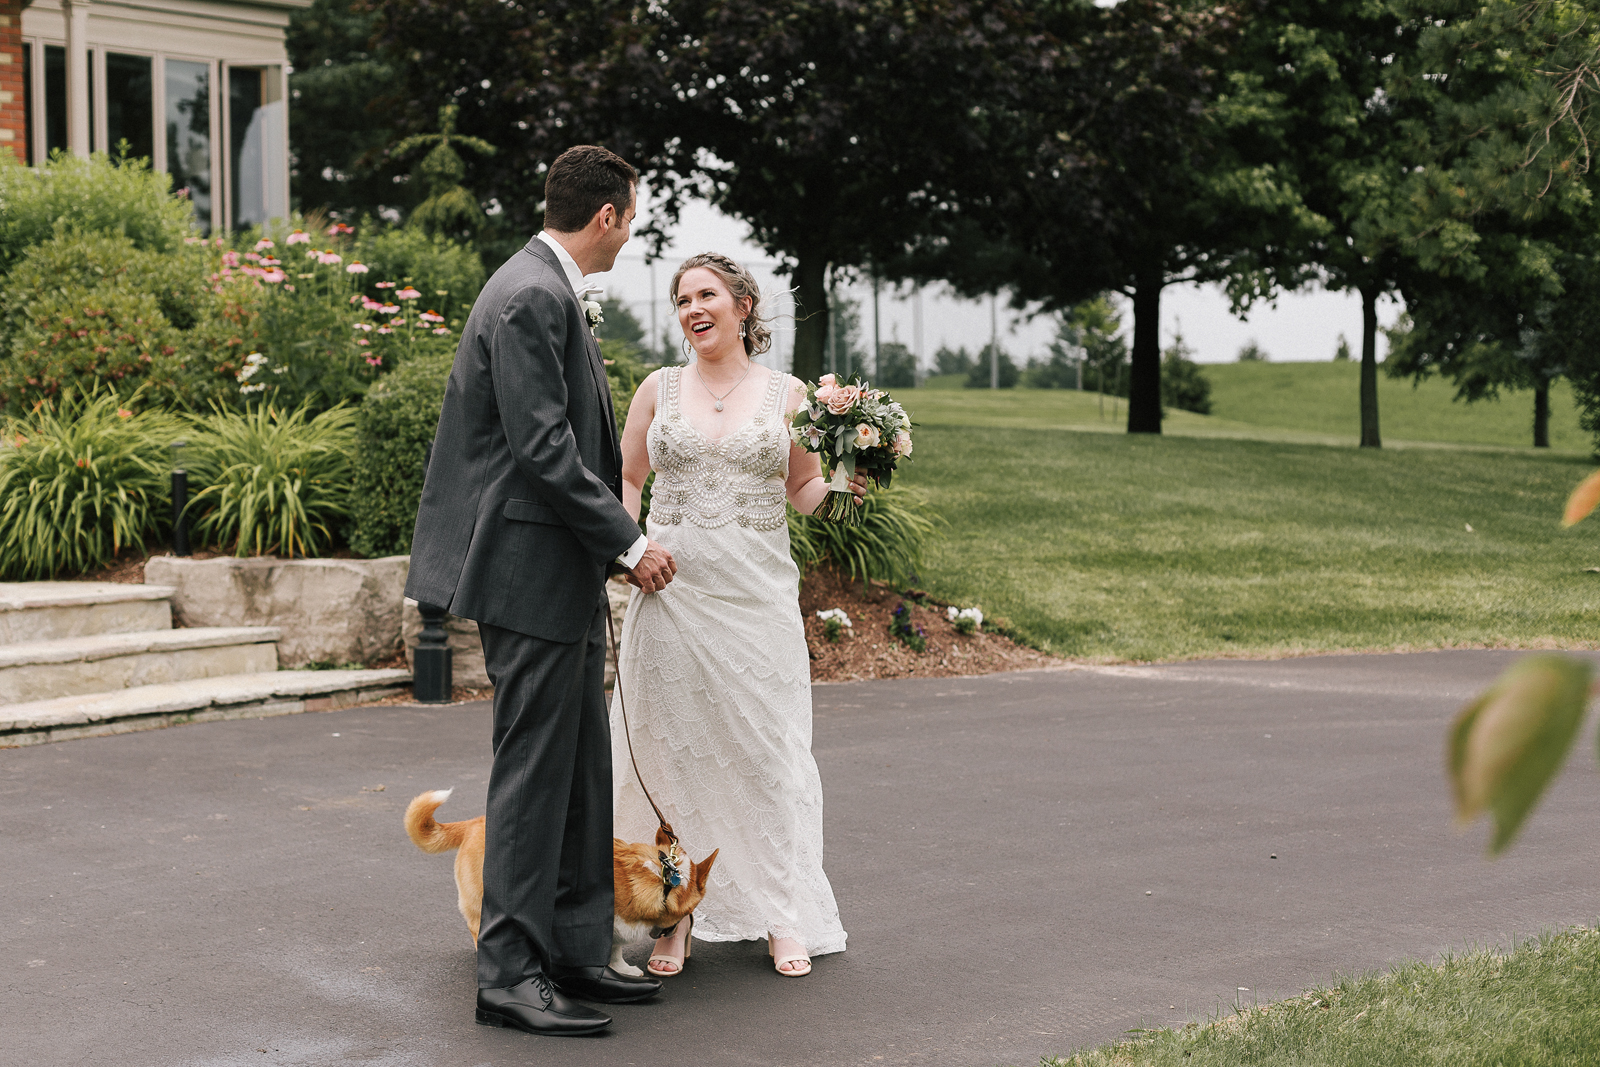 mike-and-jenni-wedding-057.jpg